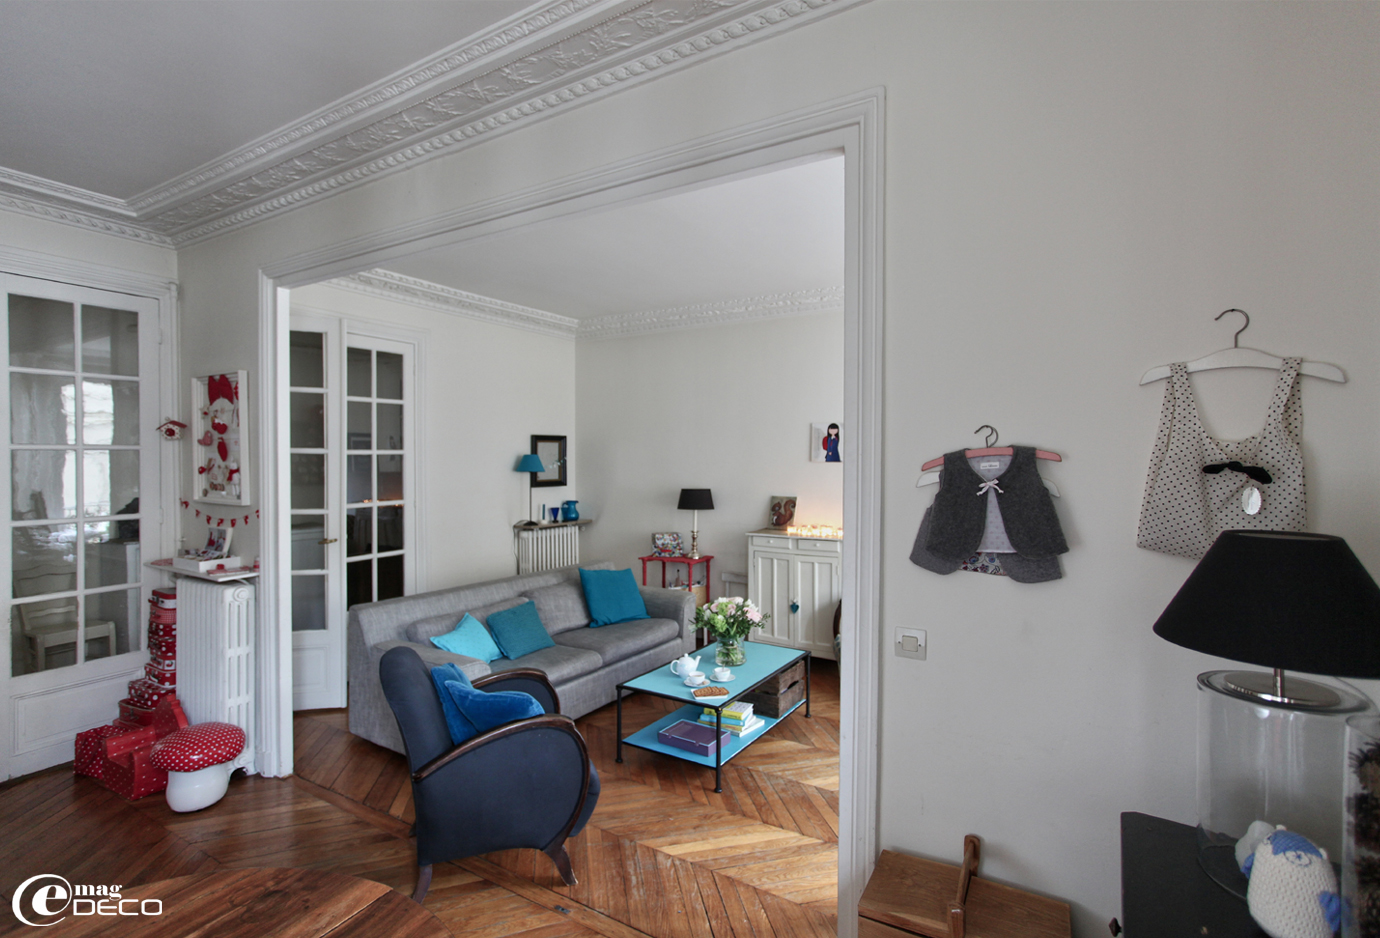 deco petit appartement parisien lb29 humatraffin. Black Bedroom Furniture Sets. Home Design Ideas